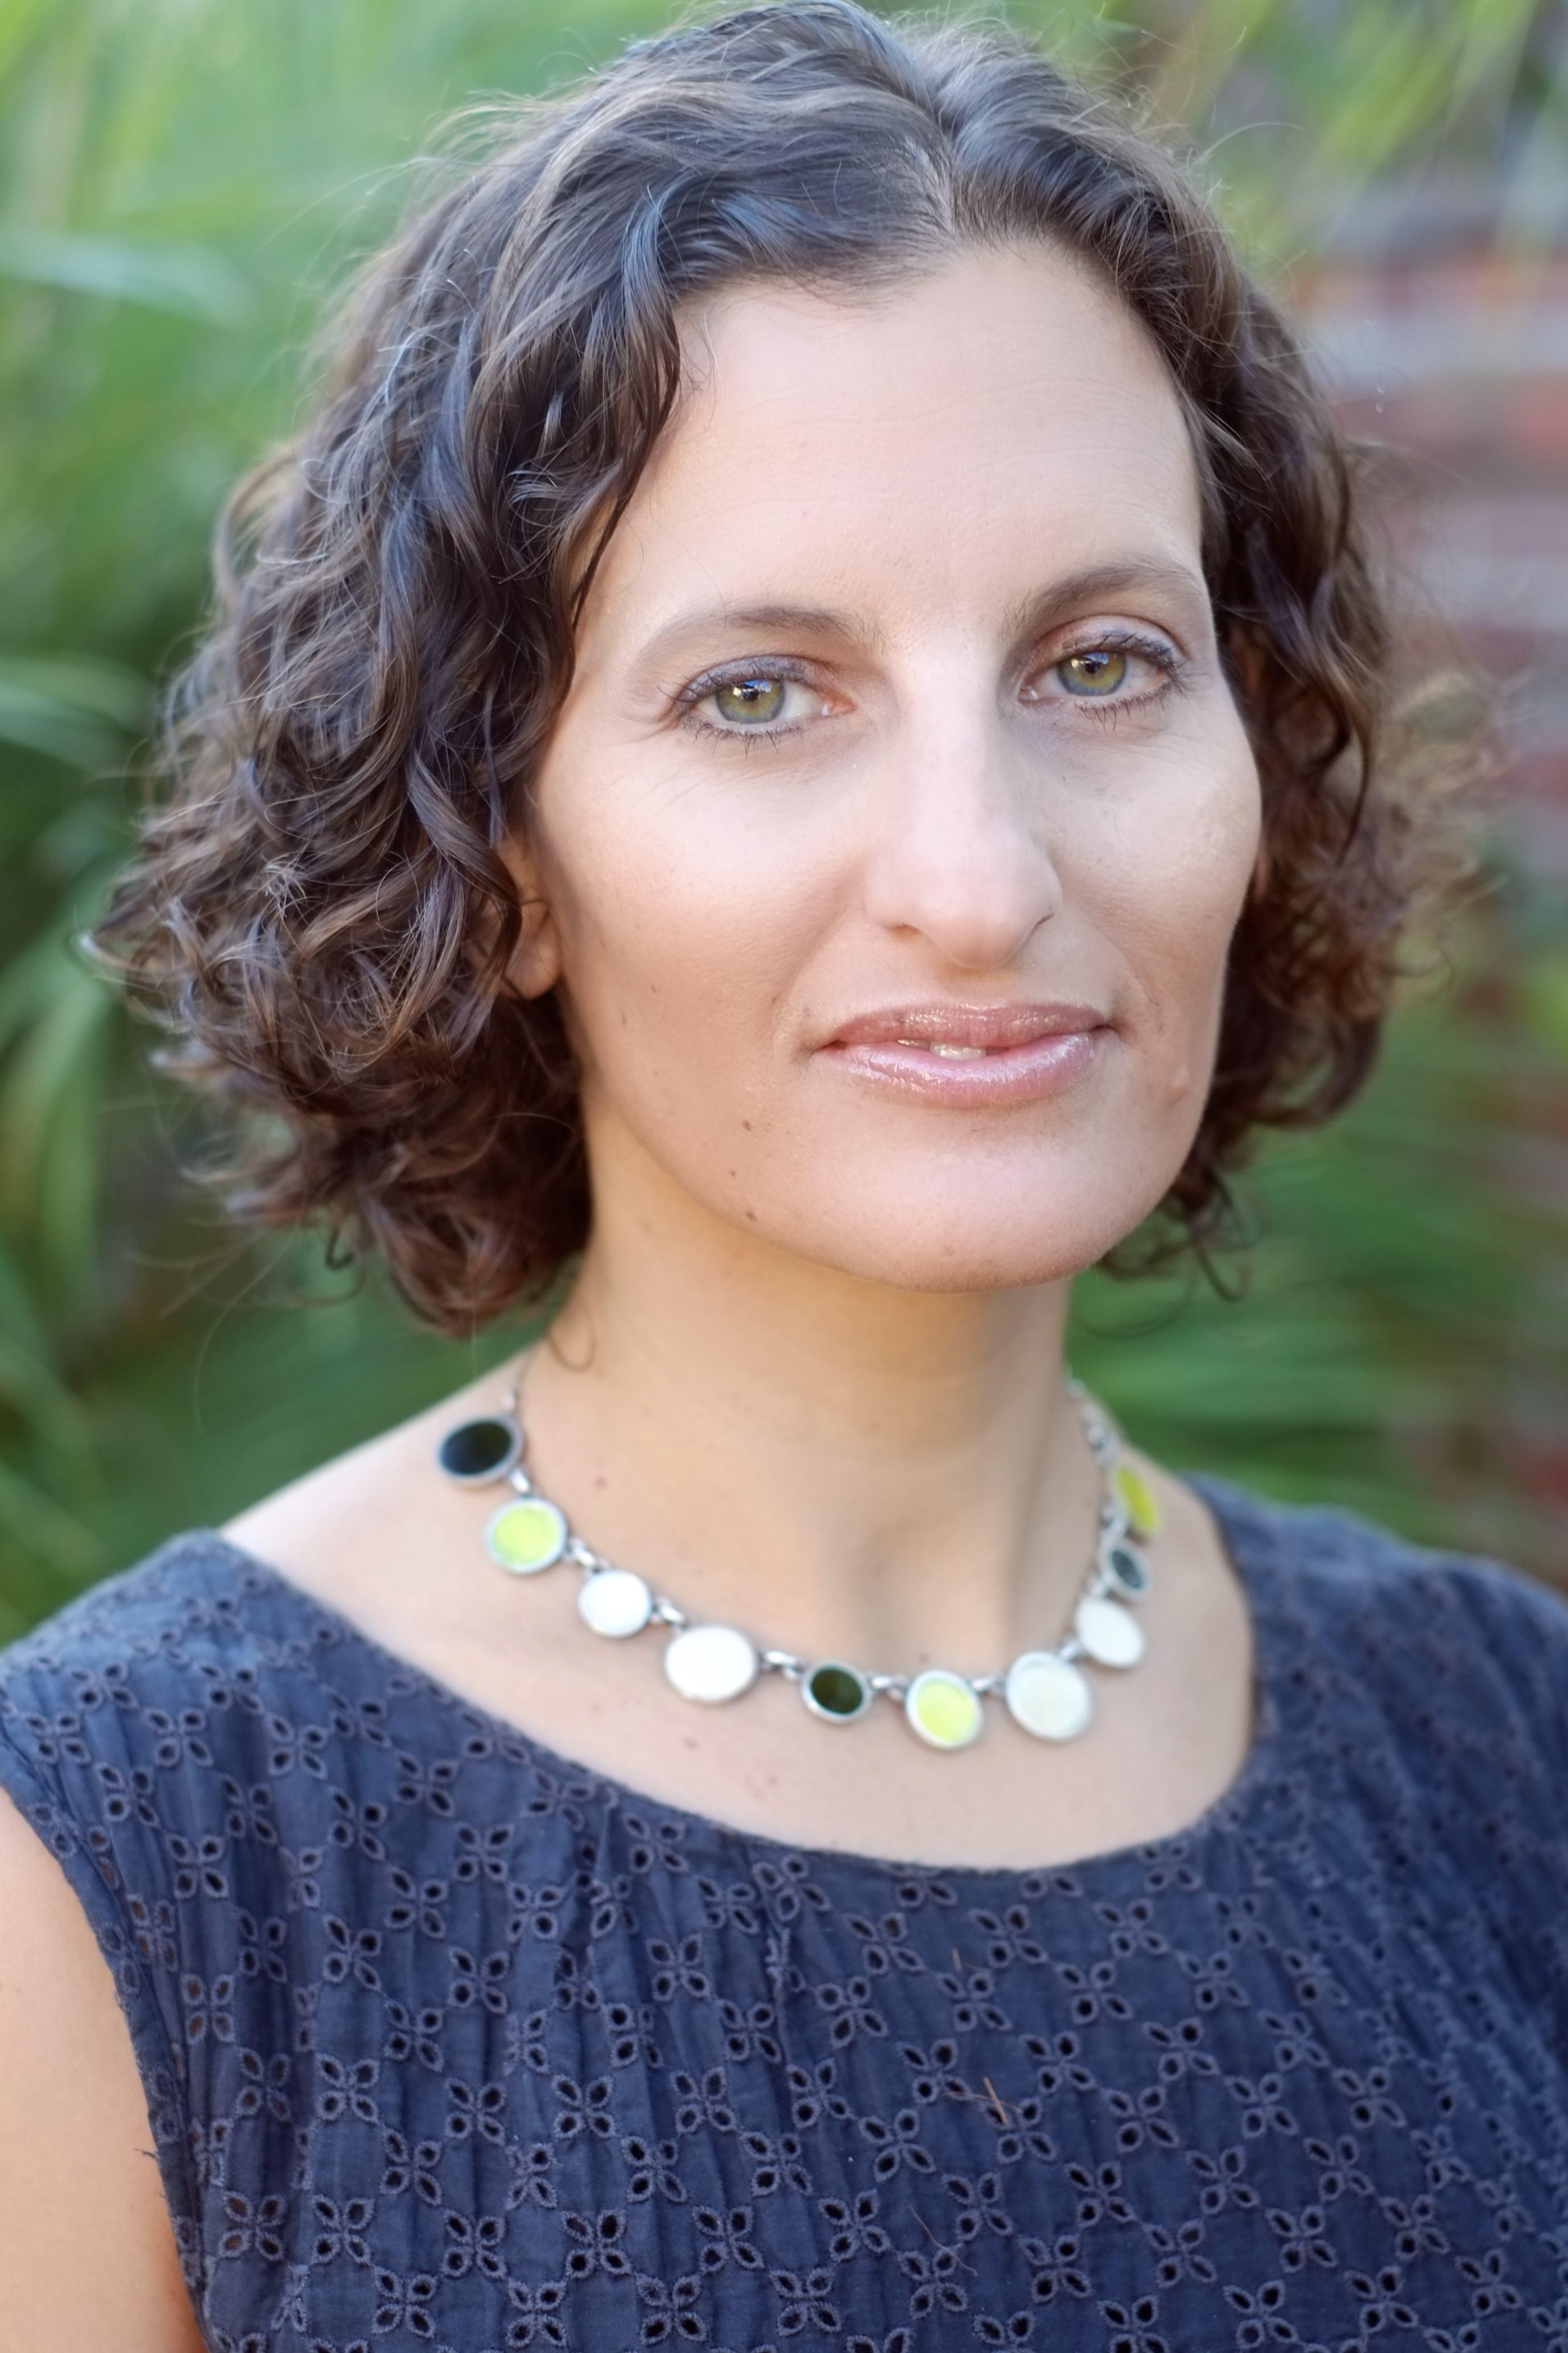 Abigail Saguy